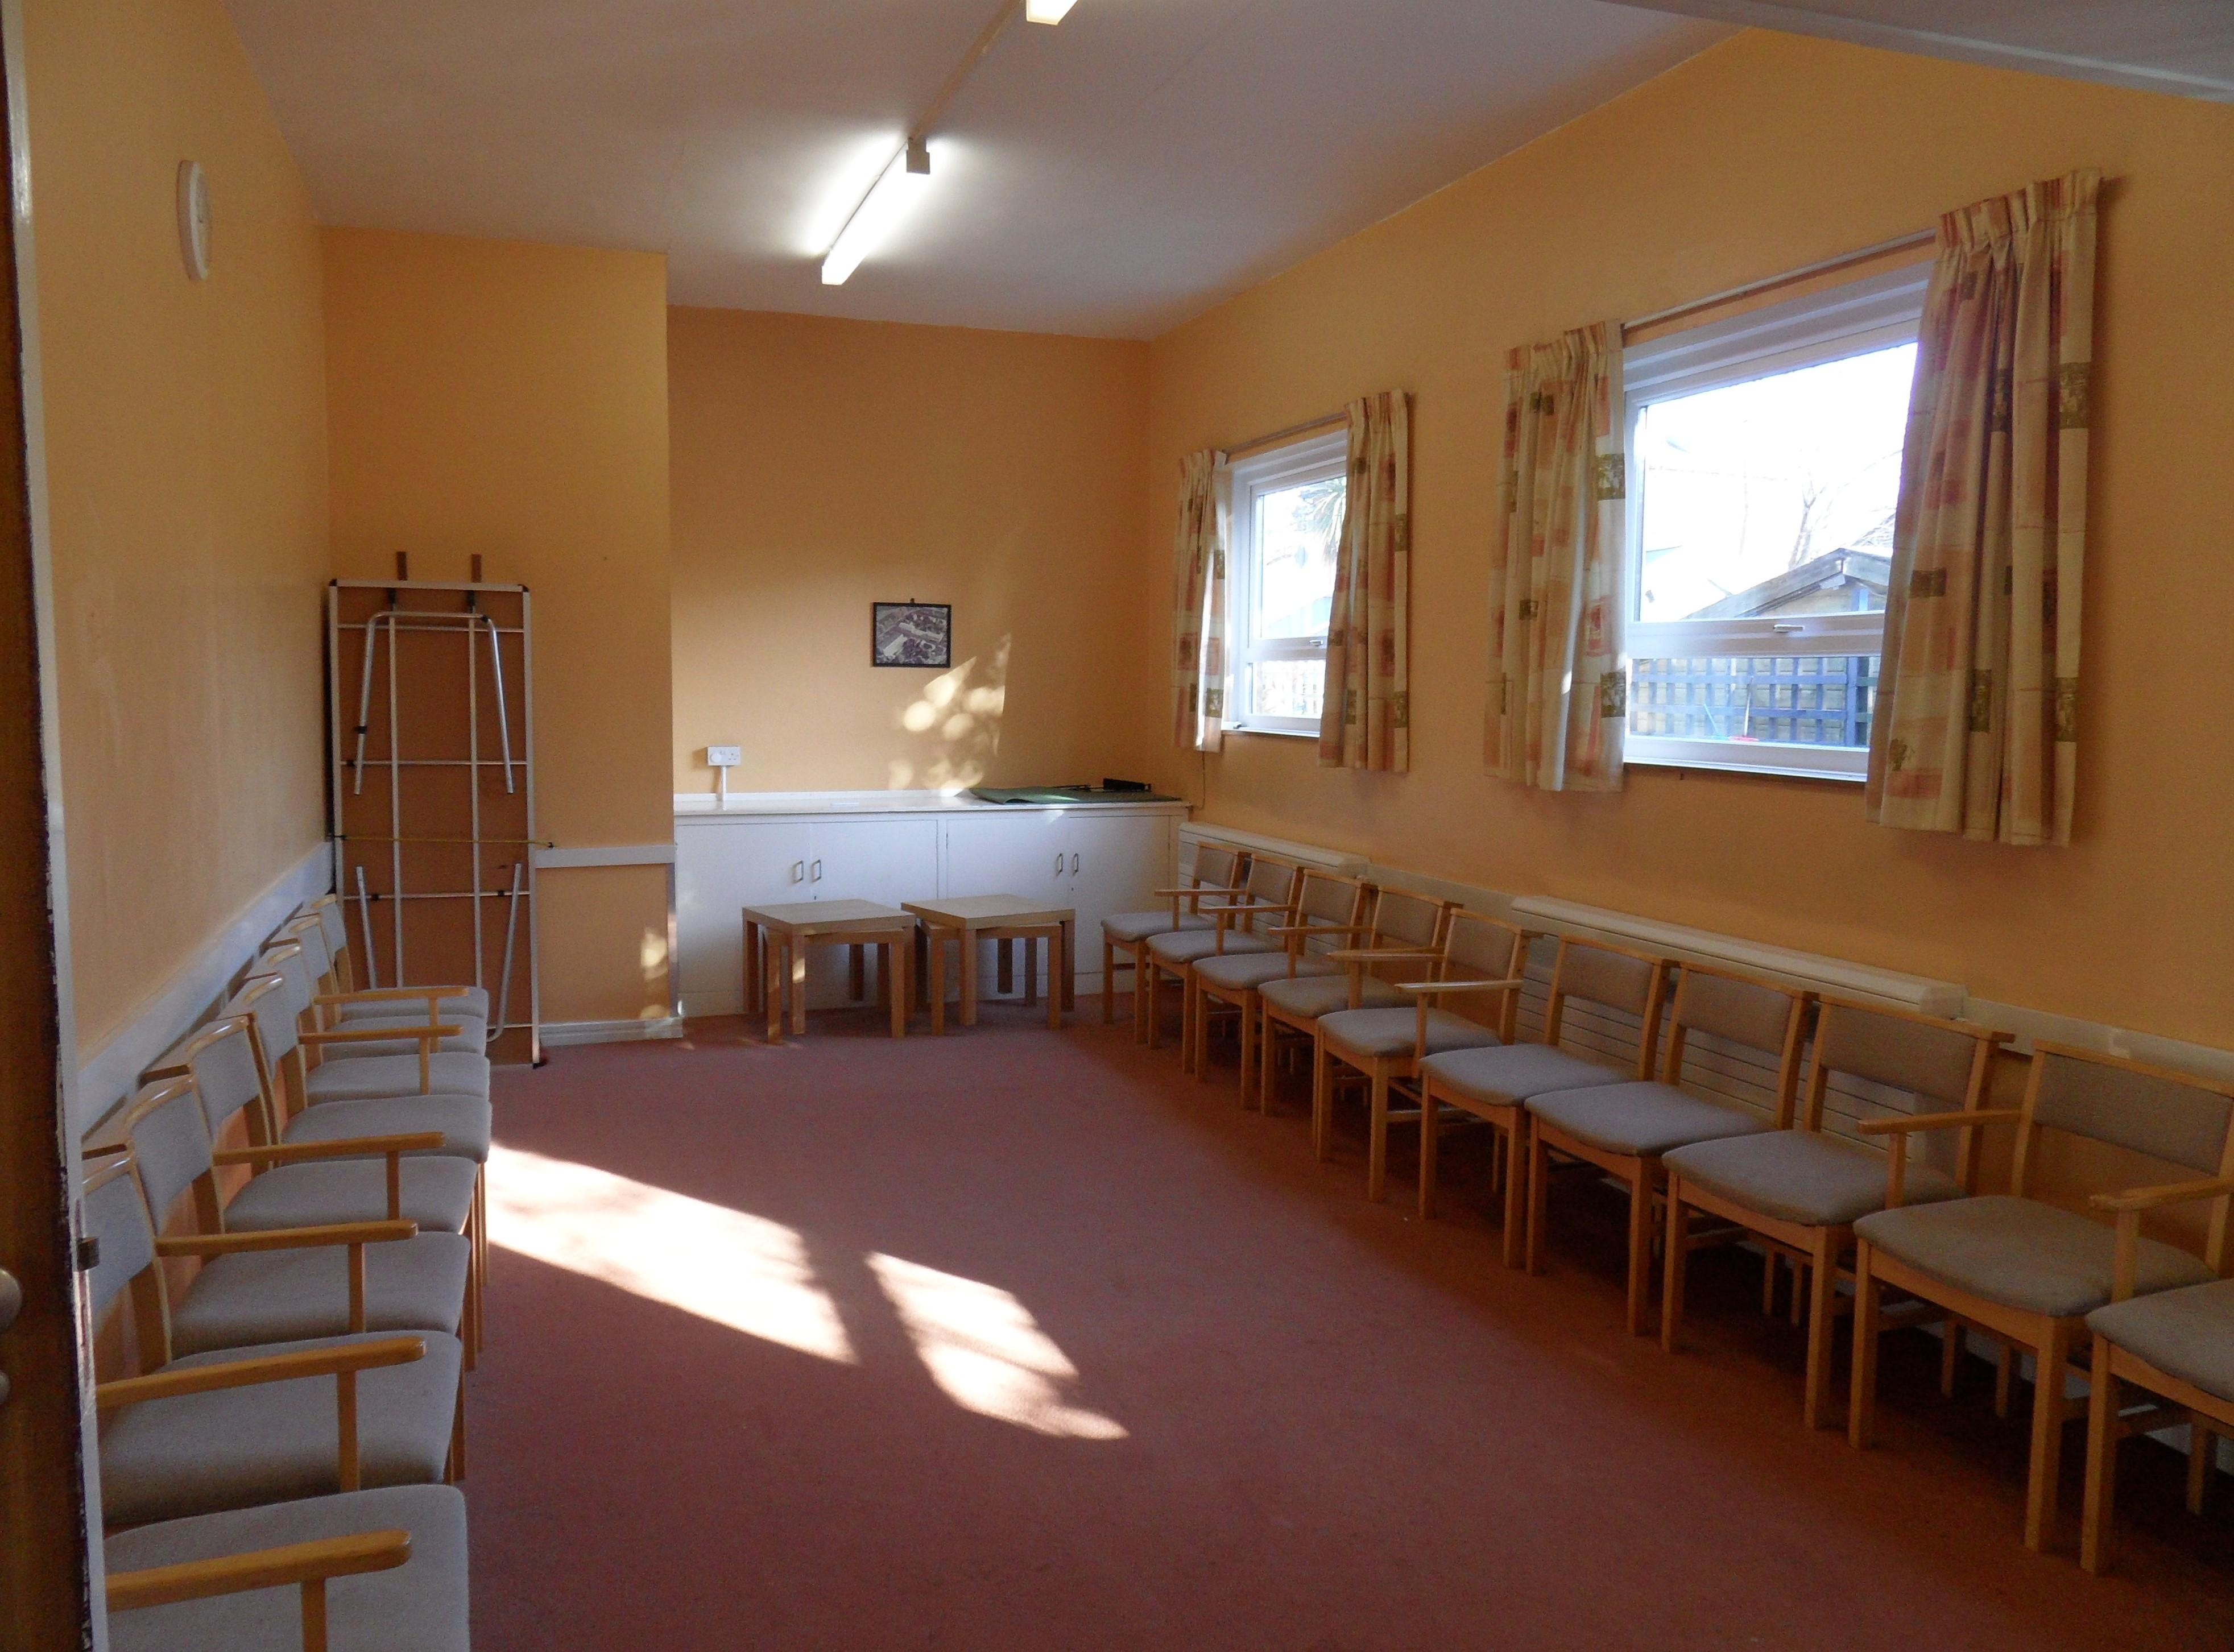 The Harwood Room